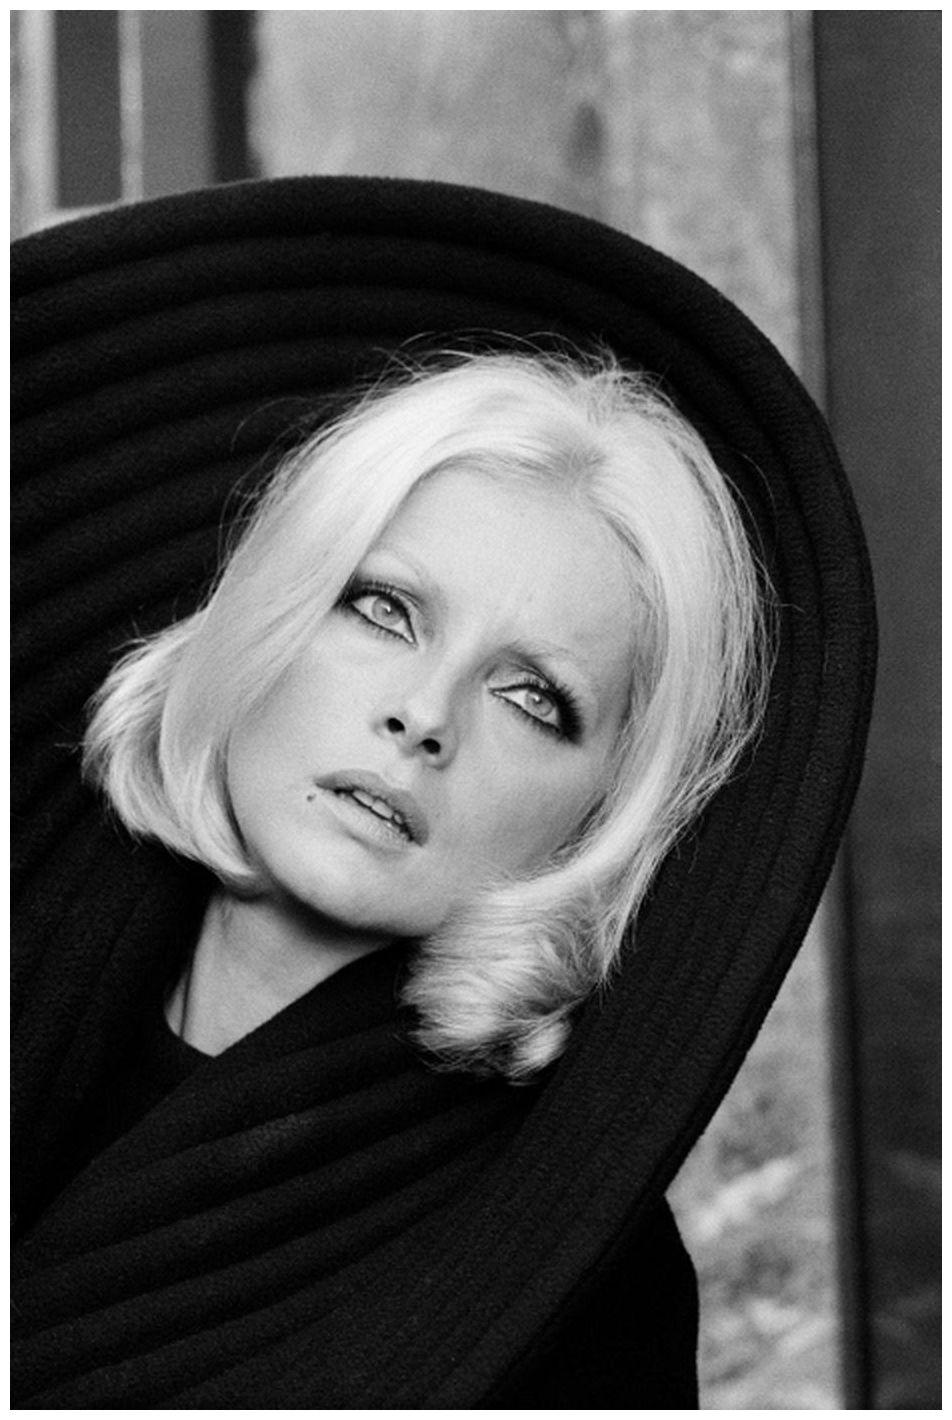 photo Virna Lisi (born 1937)